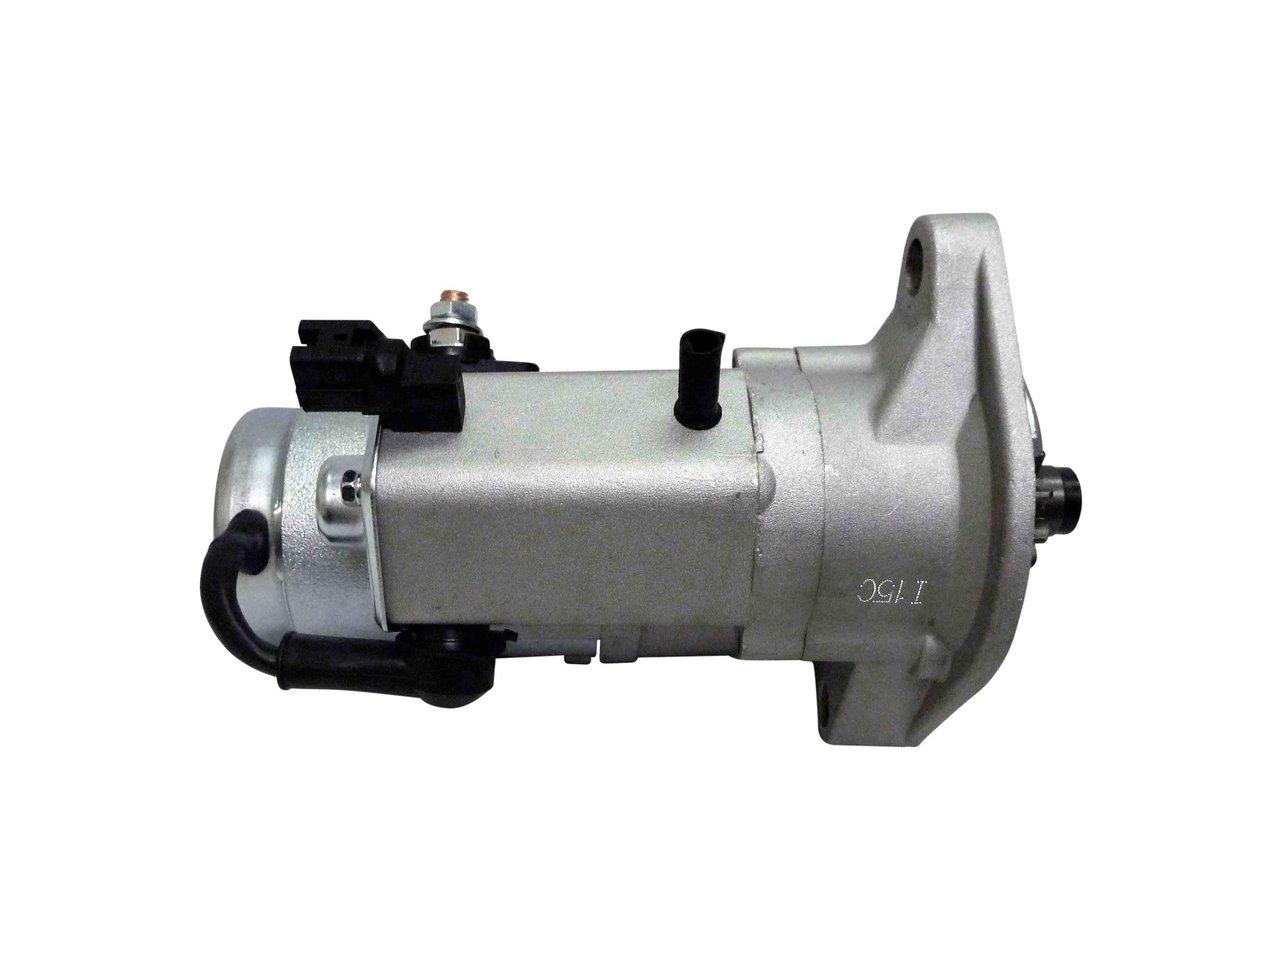 Starter Motor Suitable For Hilux Kzn165 1kzte Kun26 1kdftv Towbar Wiring Harness